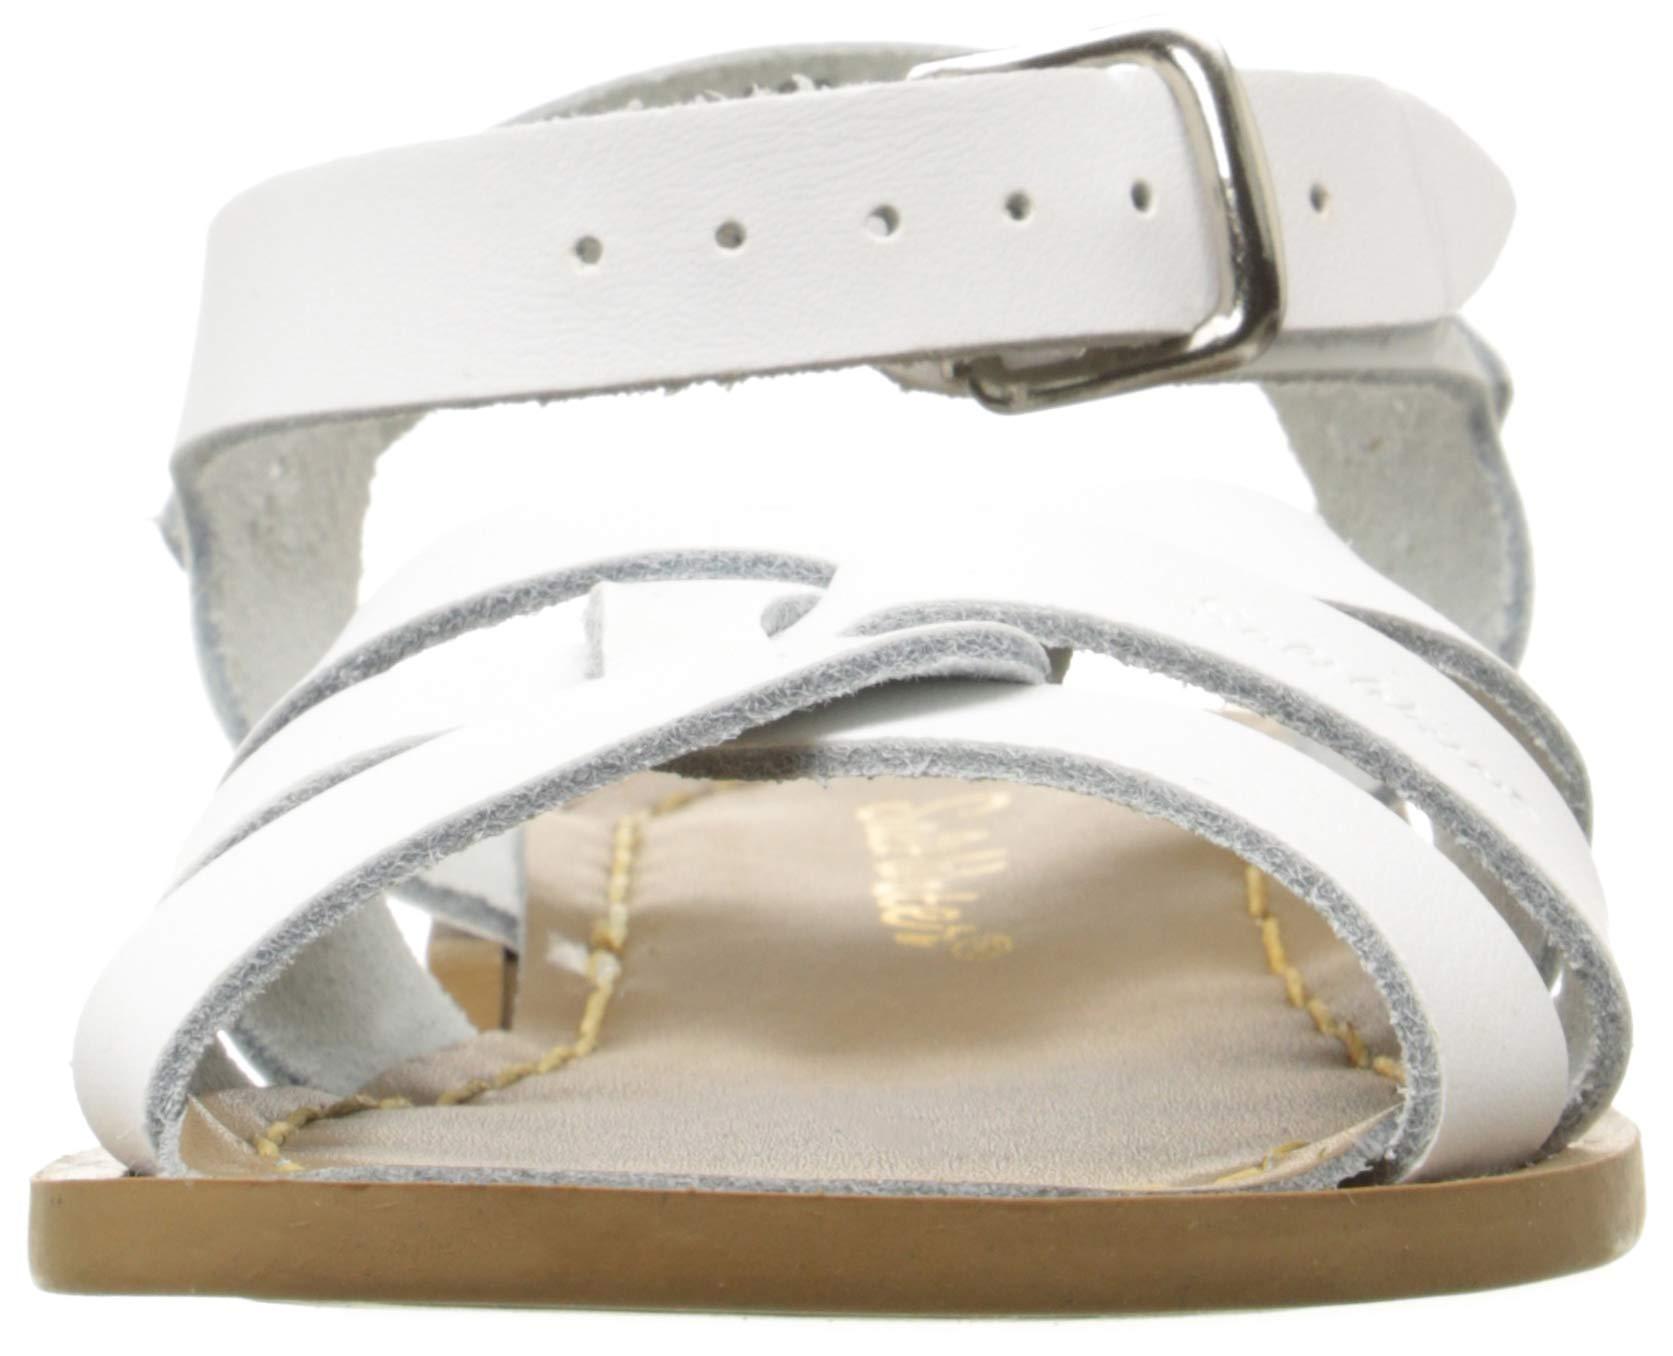 Salt Water Sandals by Hoy Shoe Original Sandal (Toddler/Little Kid/Big Kid/Women's), White, 13 M US Little Kid by Salt Water Sandals (Image #4)